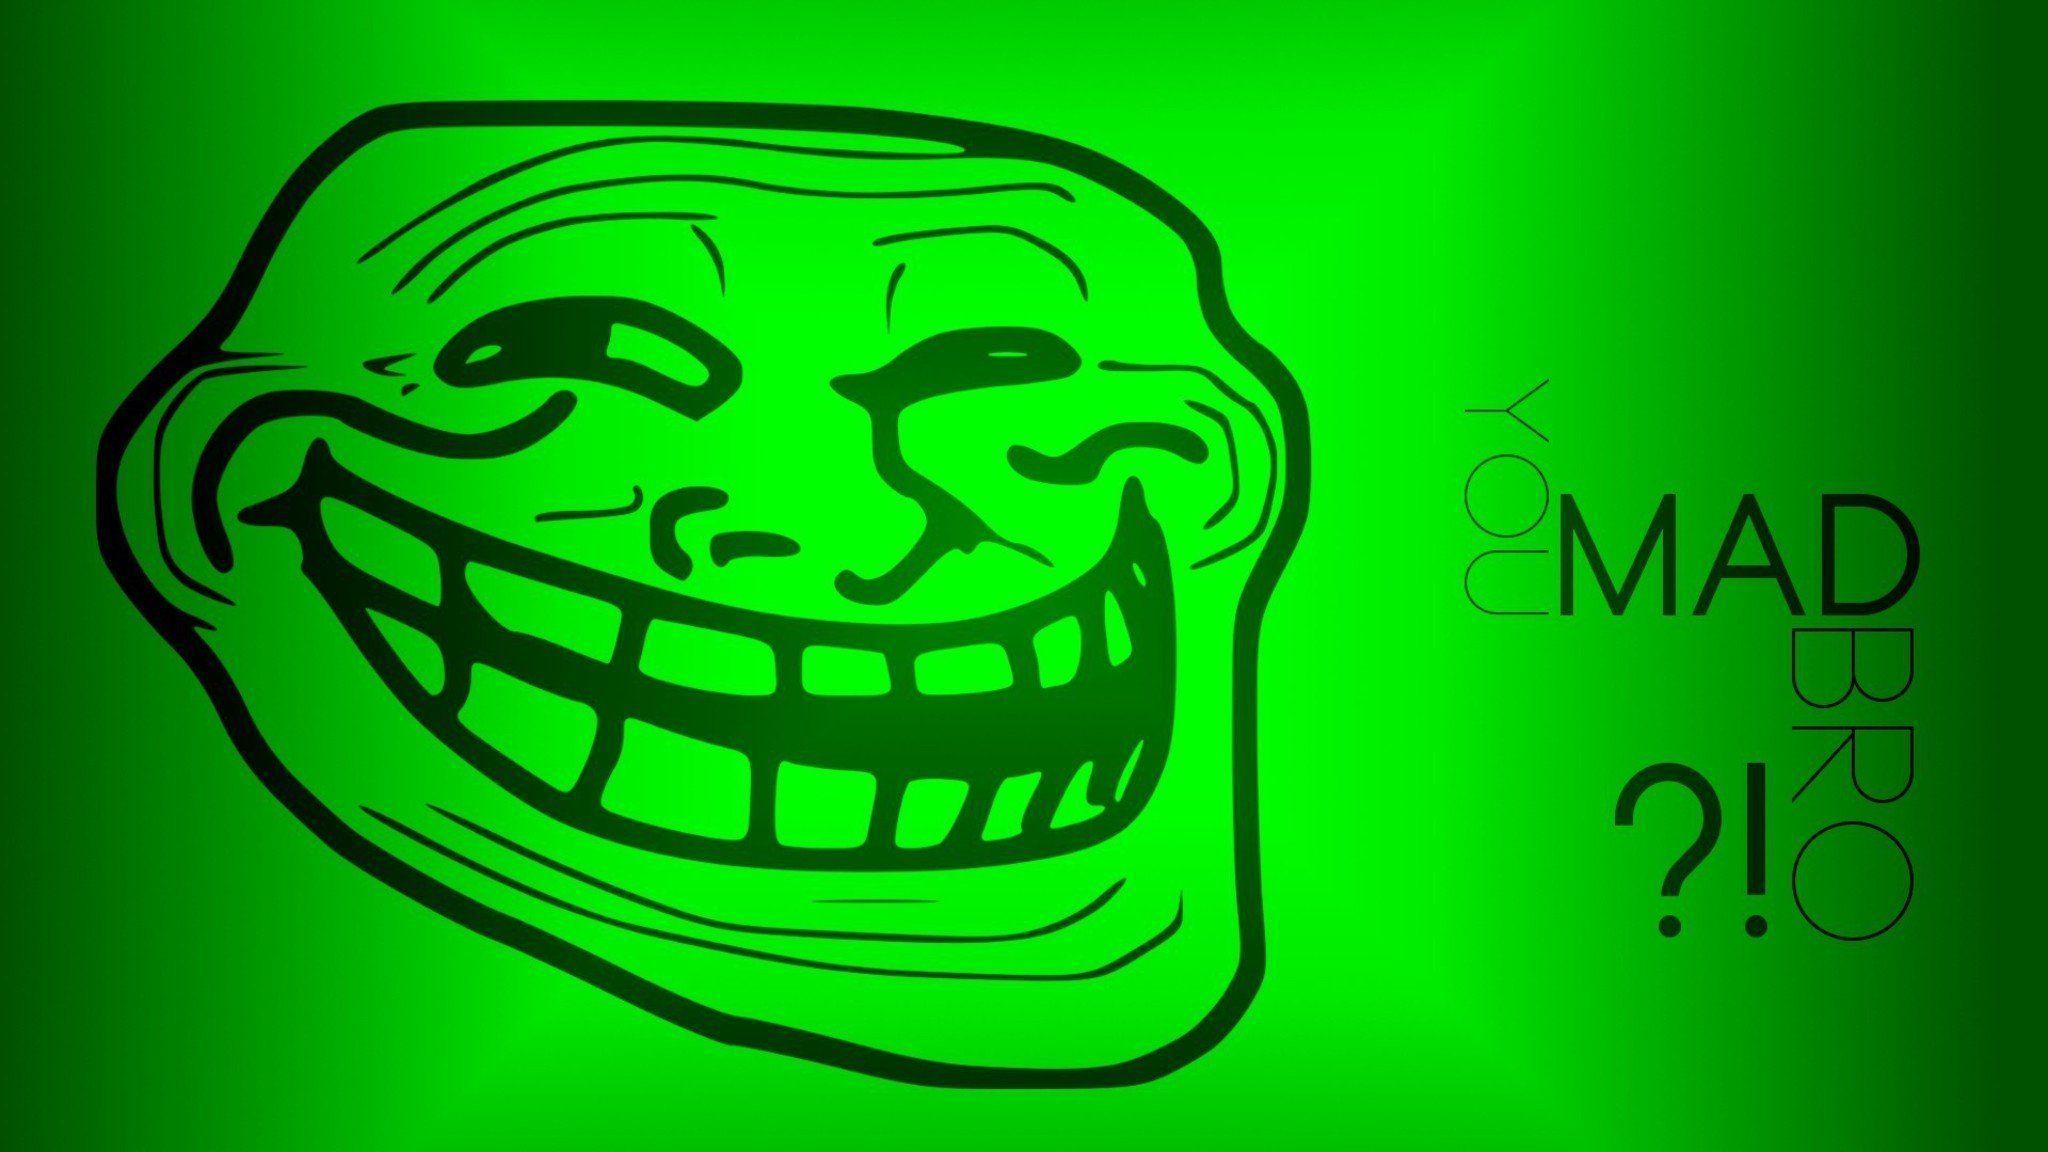 Troll Face Wallpaper Meme Wallpapers Dragon Ball Troll Face Top